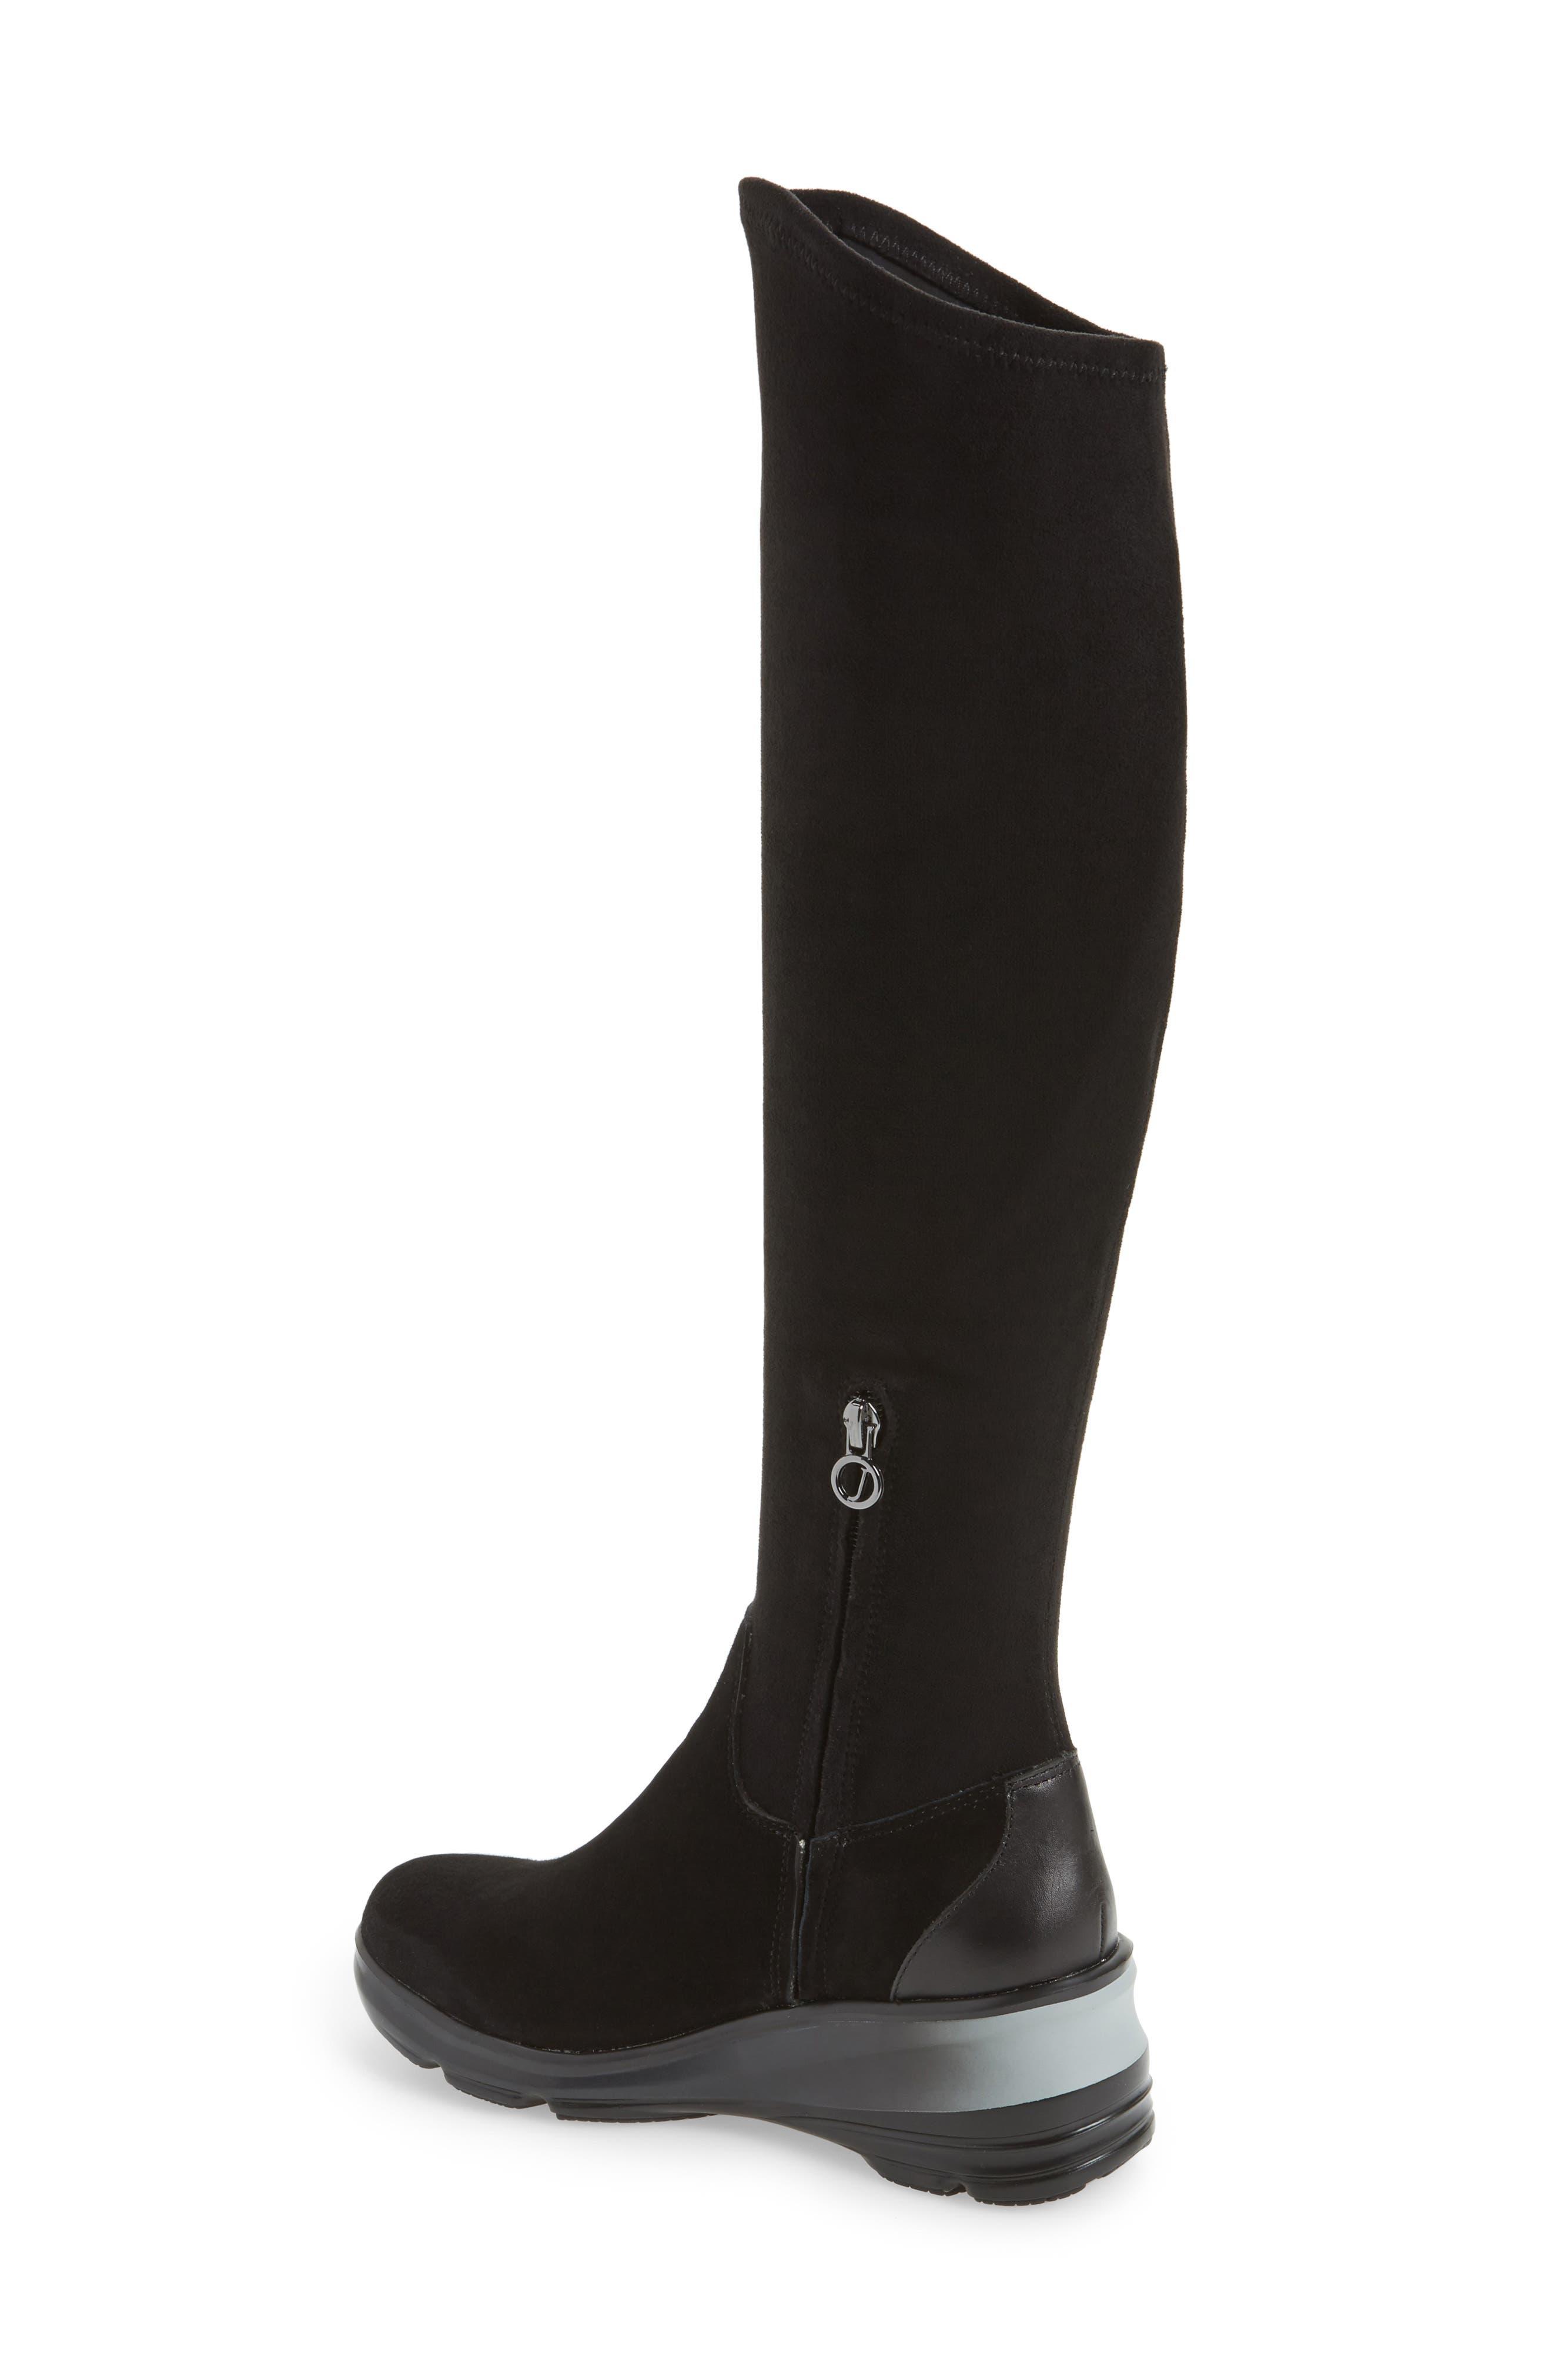 Alternate Image 2  - Jambu Kendra Over the Knee Water-Resistant Boot (Women)